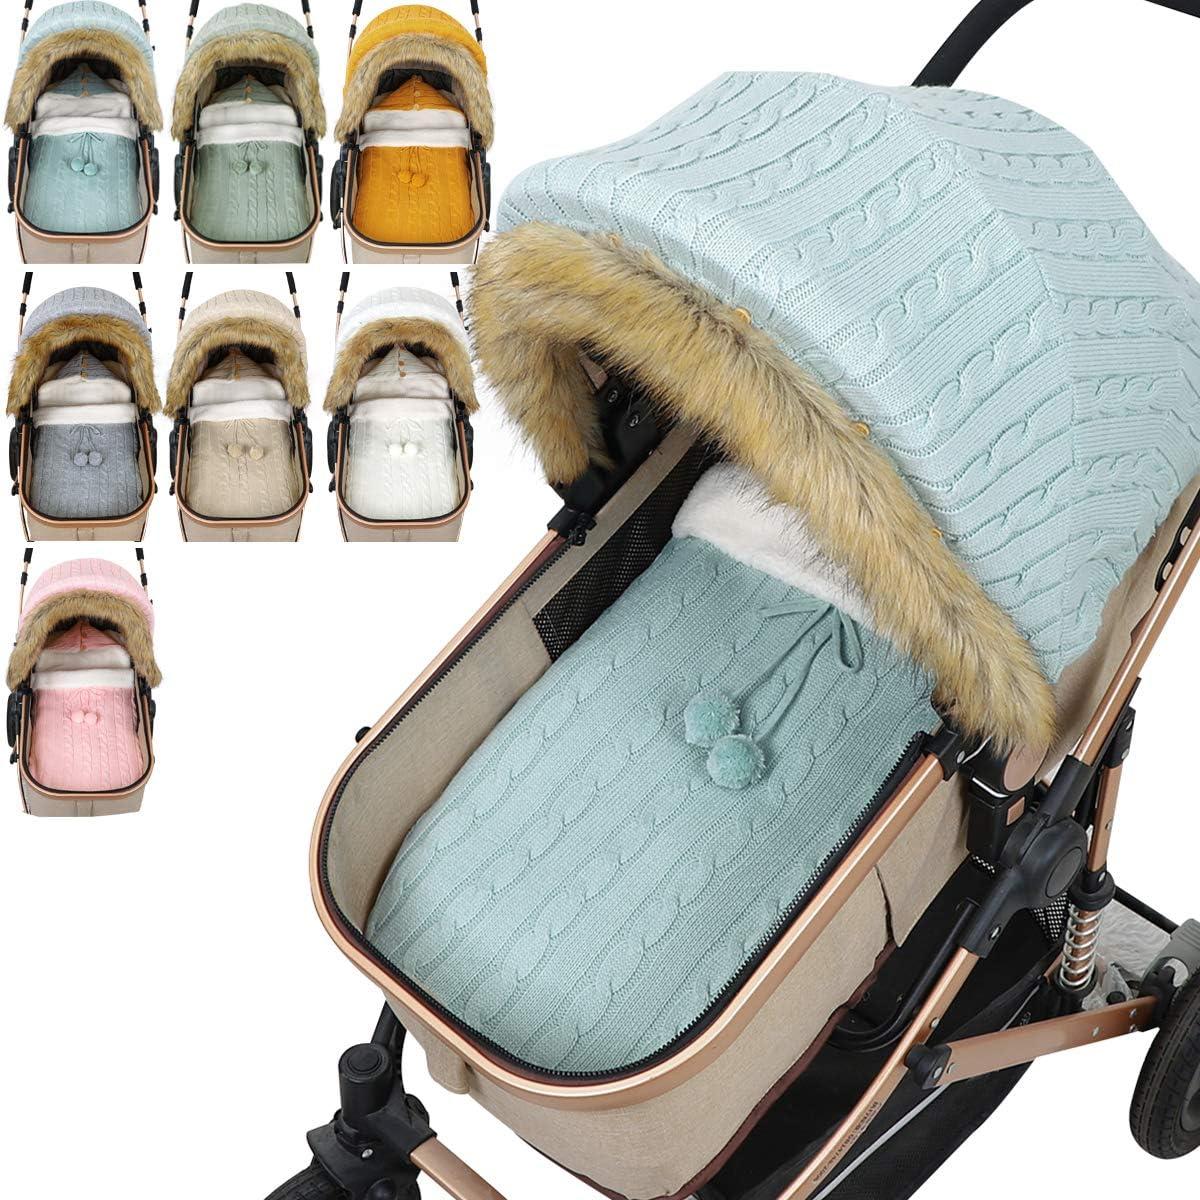 Bebé Tejido Saco de Dormir Cochecito Conjunto de Cubierta Recién Nacido Asiento de Coche para Bebés Dosel Cálido Crochet Cochecito Envolver Manta Saco de Dormir para 0-12 Meses